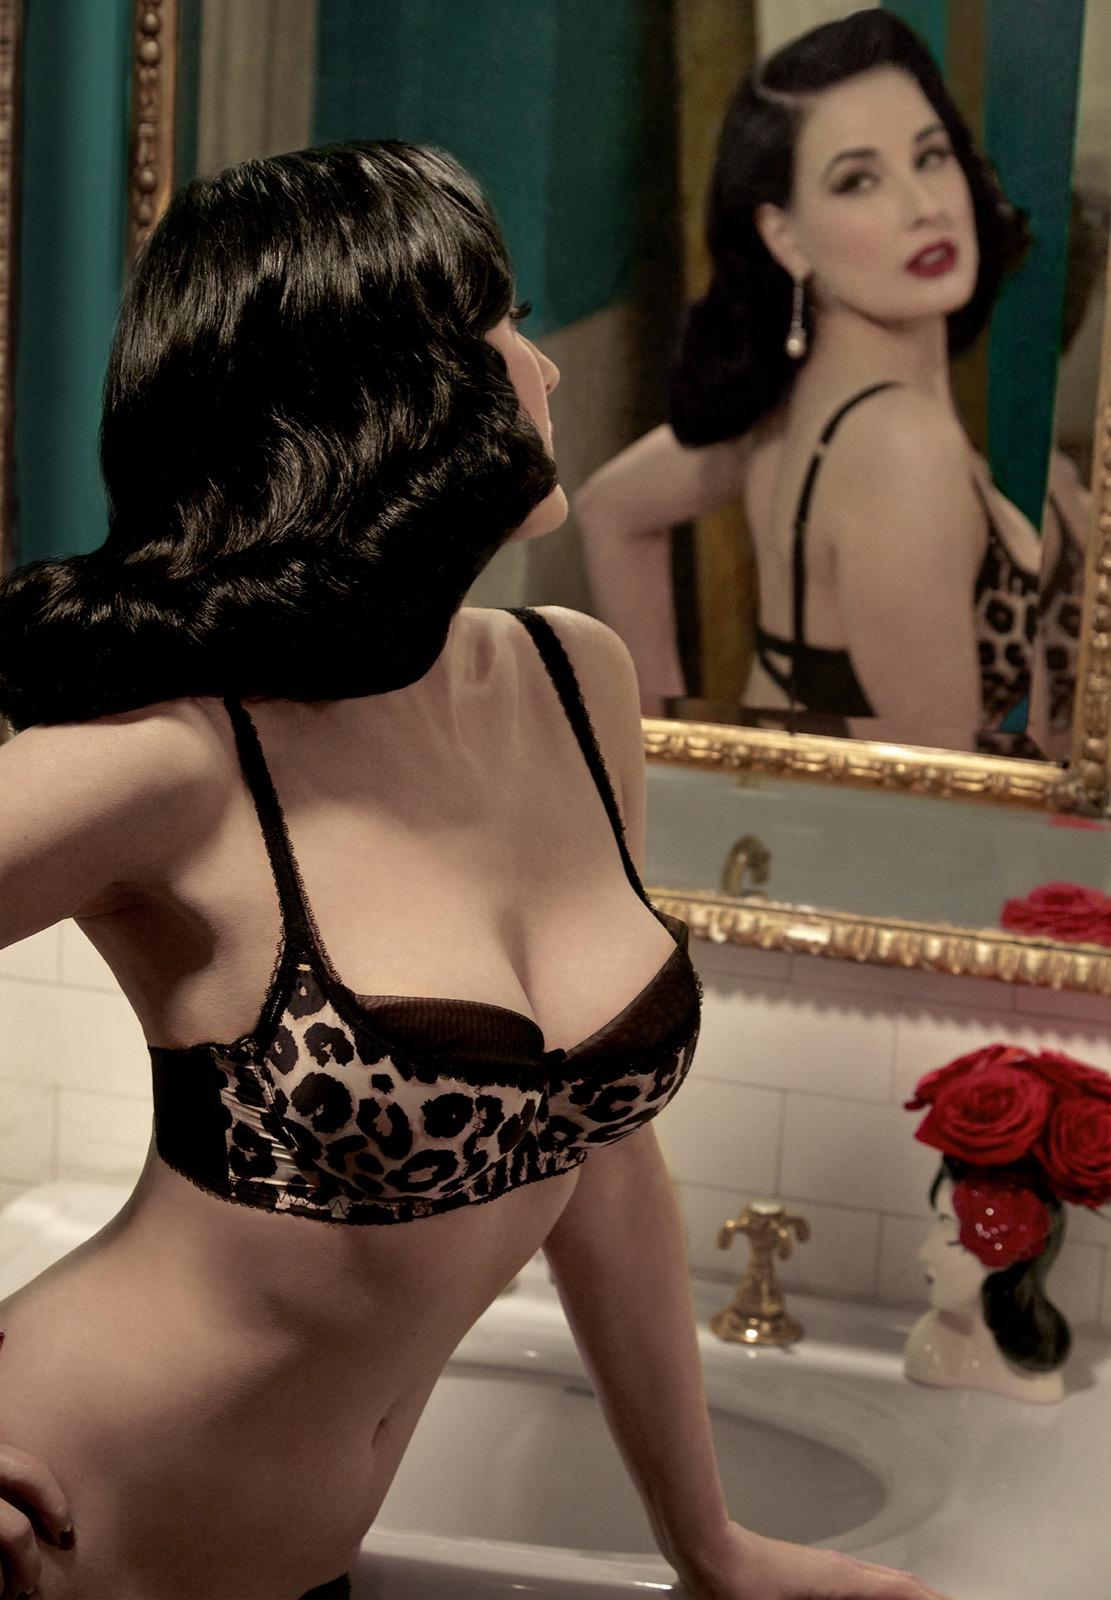 Shooting Dita Von Teese - Vintage Lingerie Classic 1950s